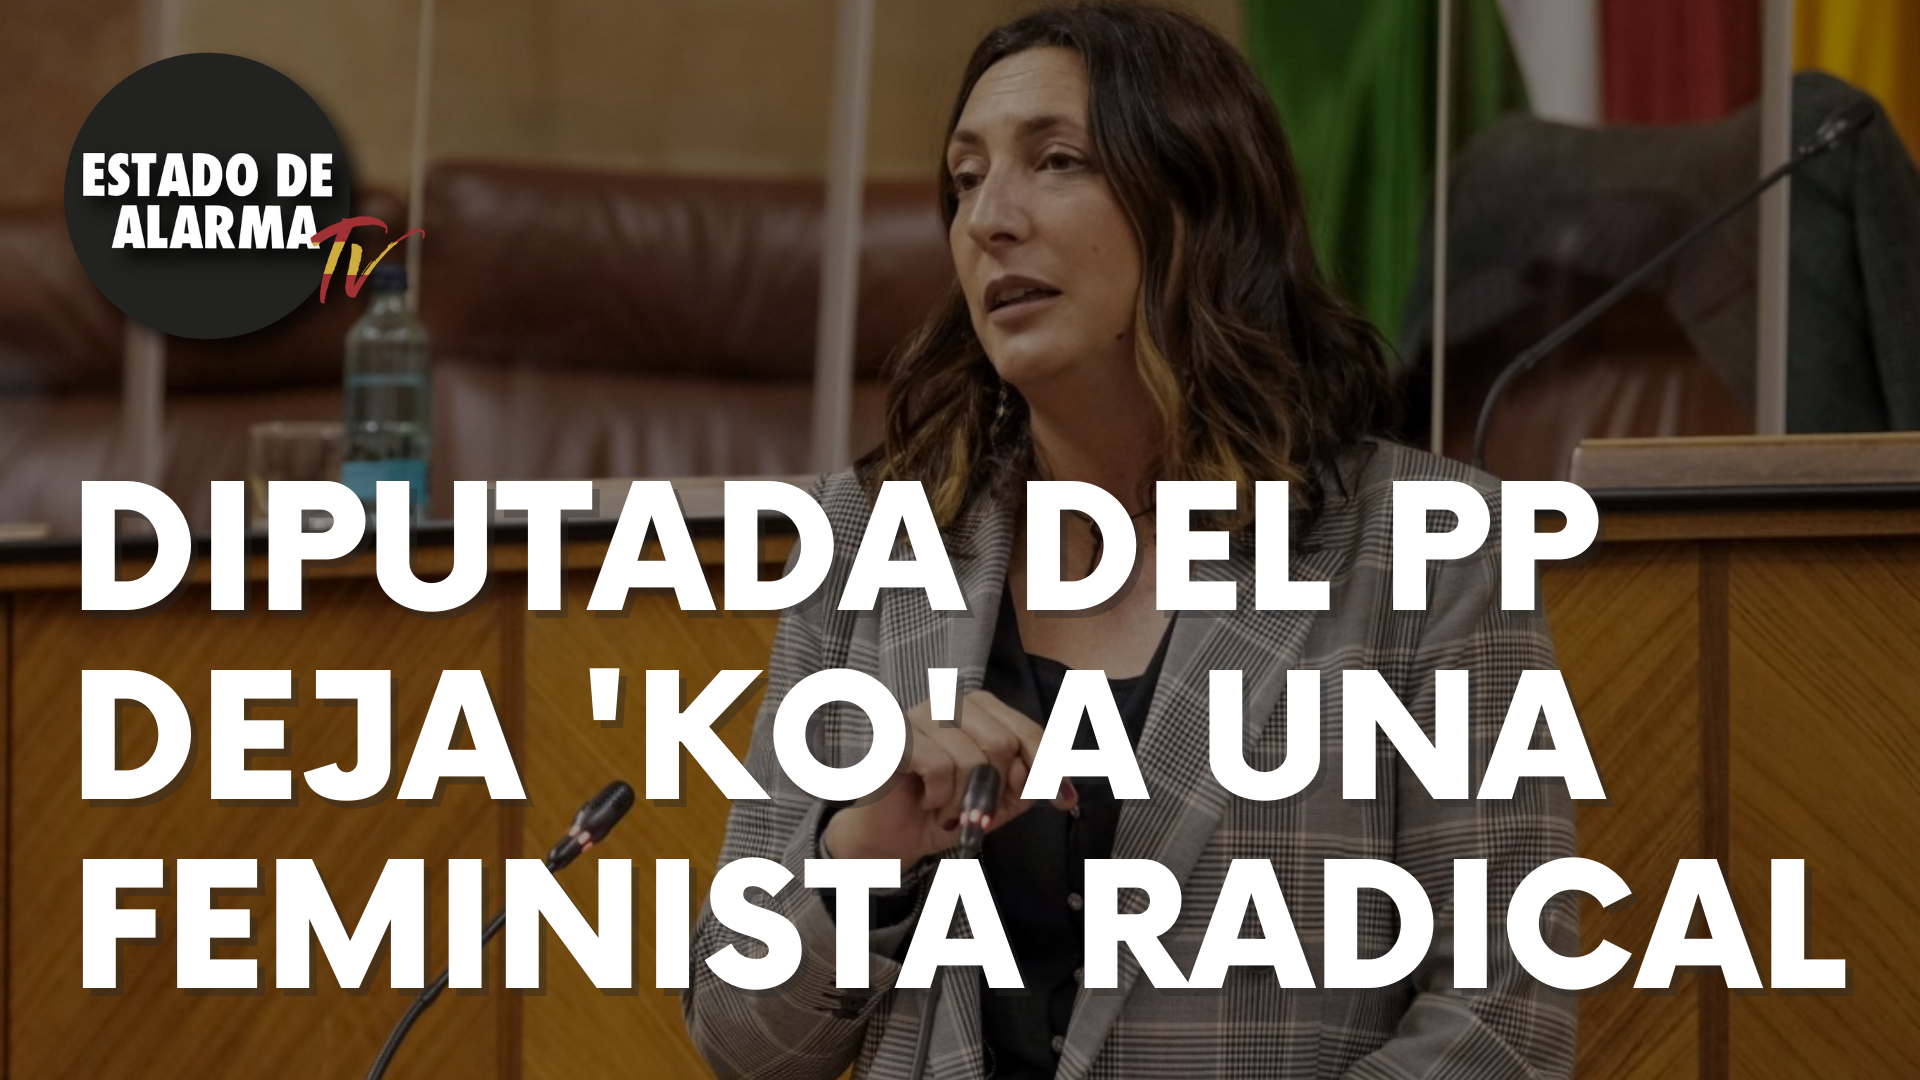 Una diputada del PP deja 'KO' a una feminista radical